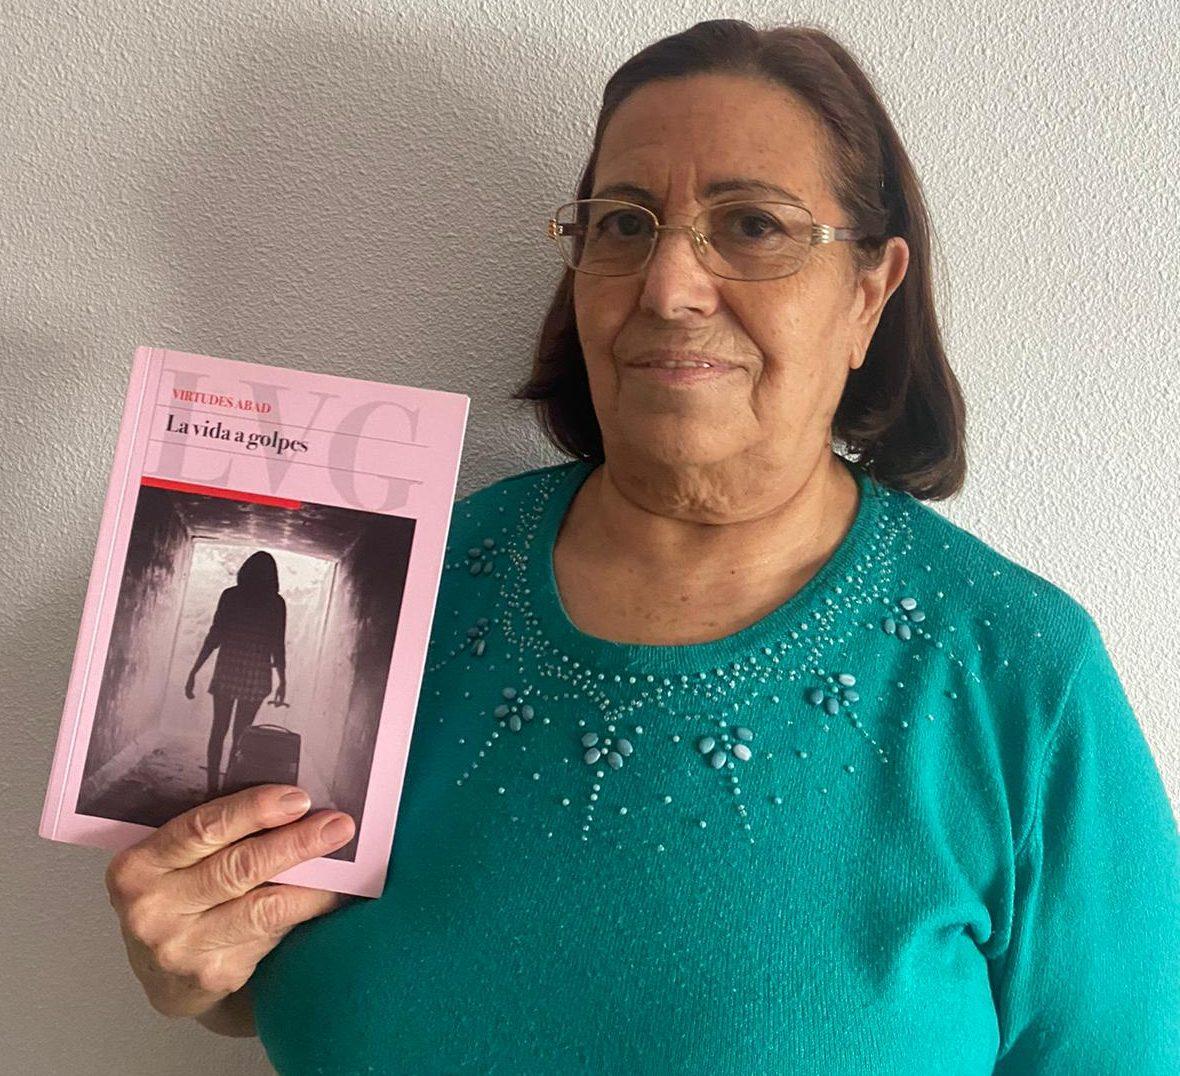 Virtudes Abad, autora de «La vida a golpes» Entrevistes - 8 de març de 2021